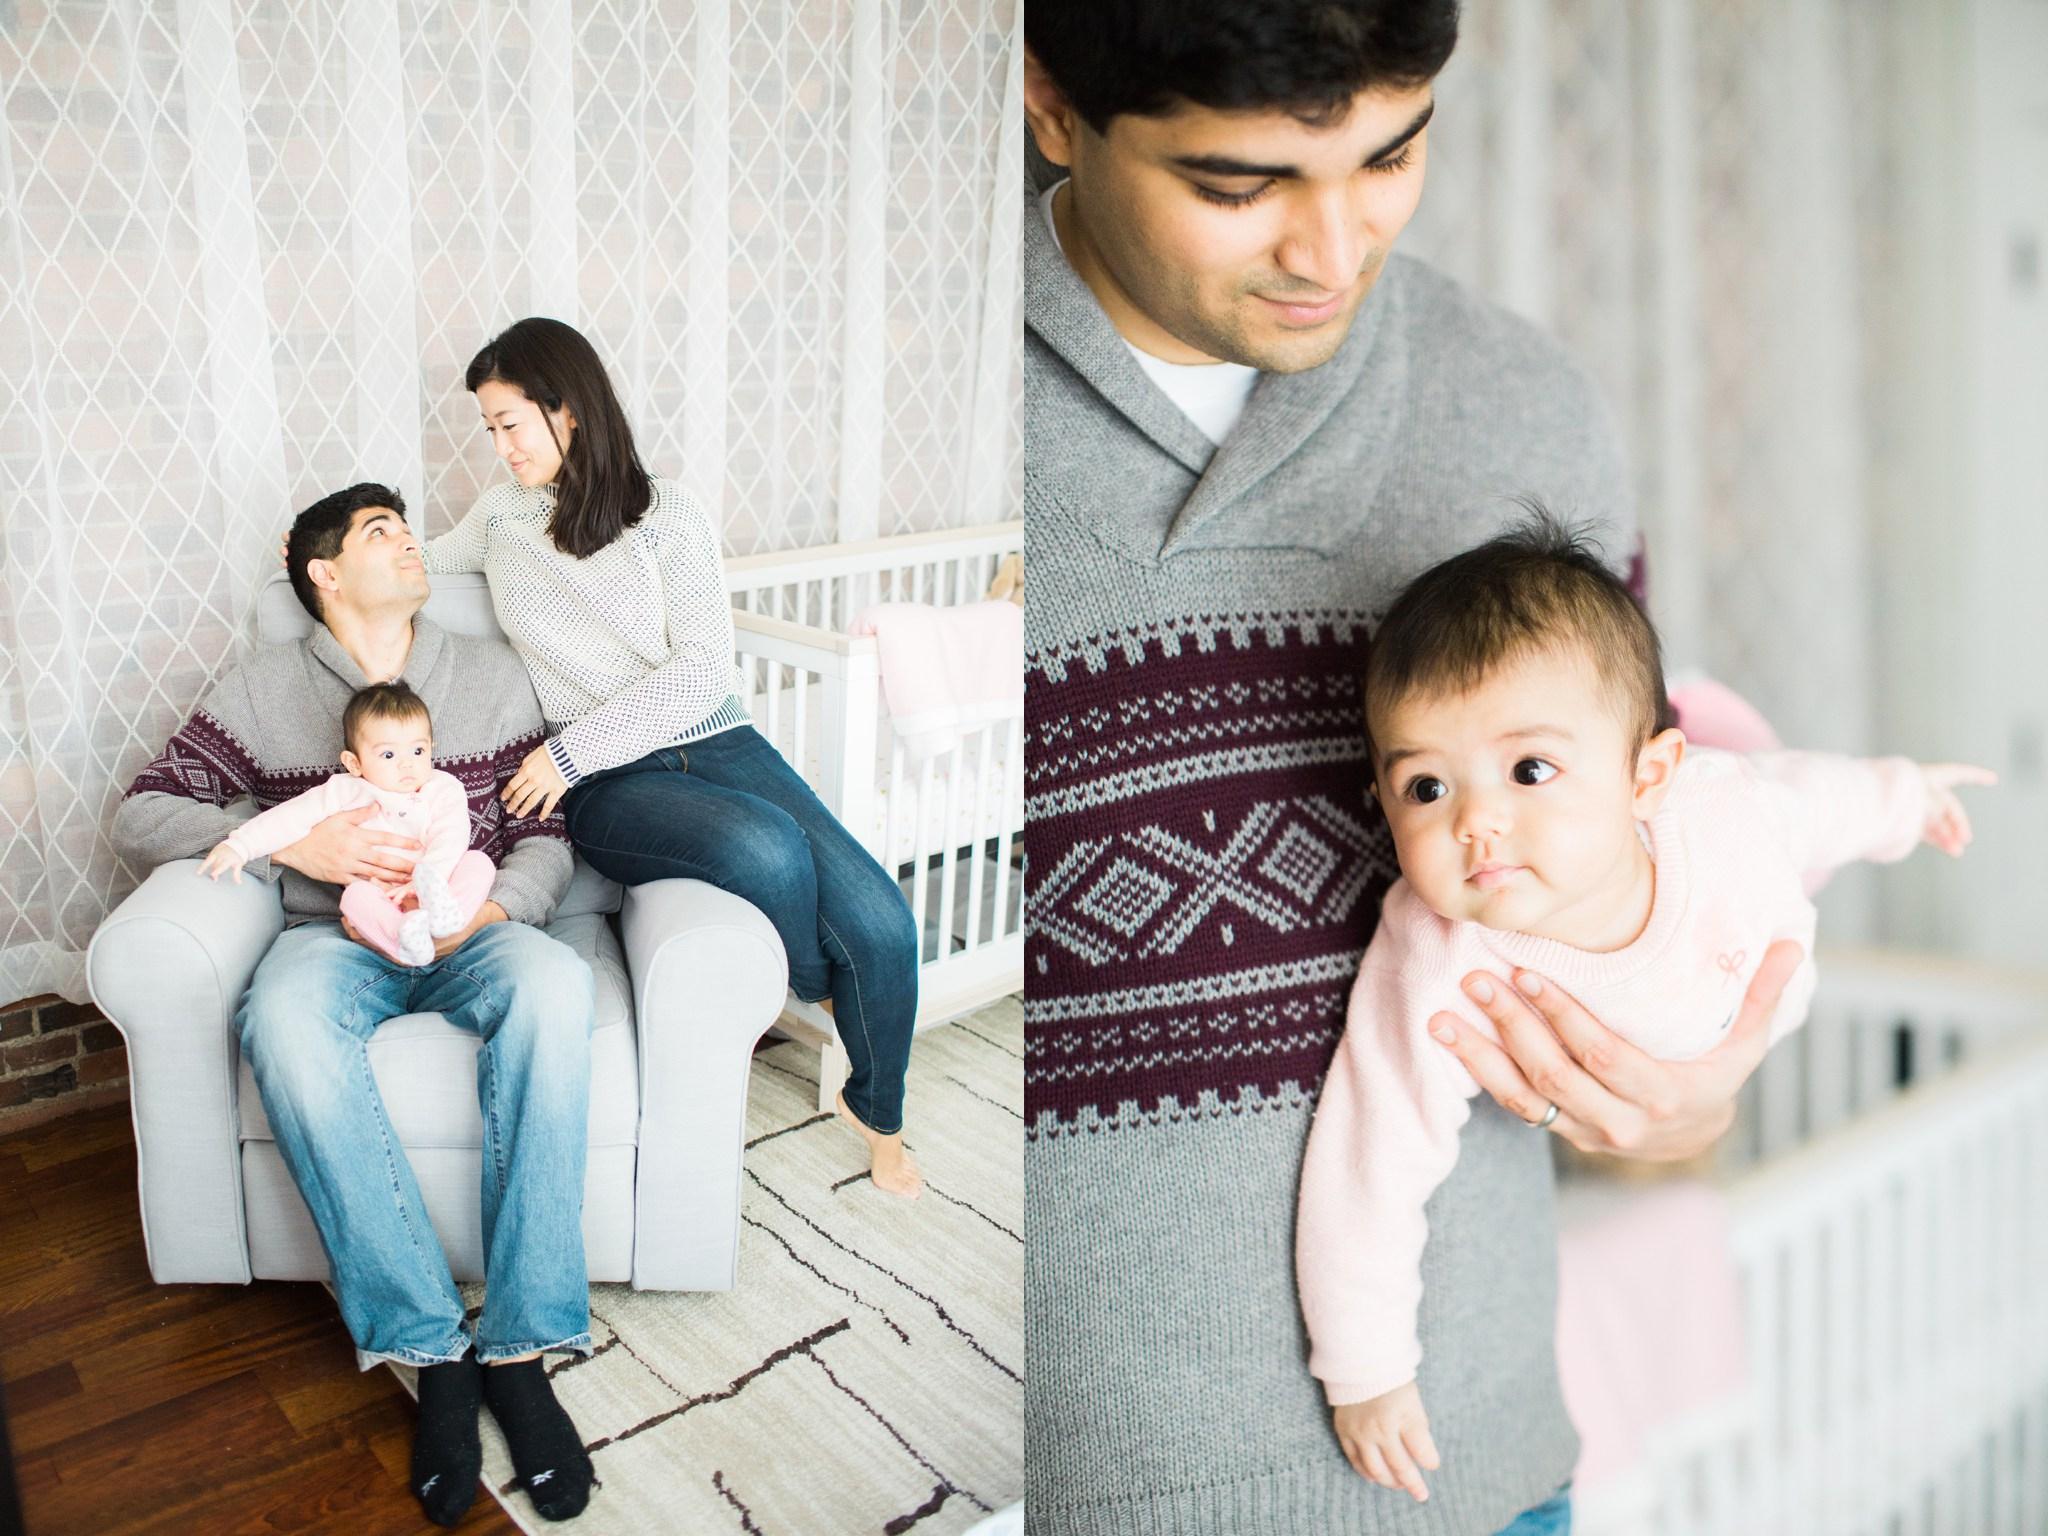 south_boston_family_portraits_deborah_zoe_photography_00016.JPG